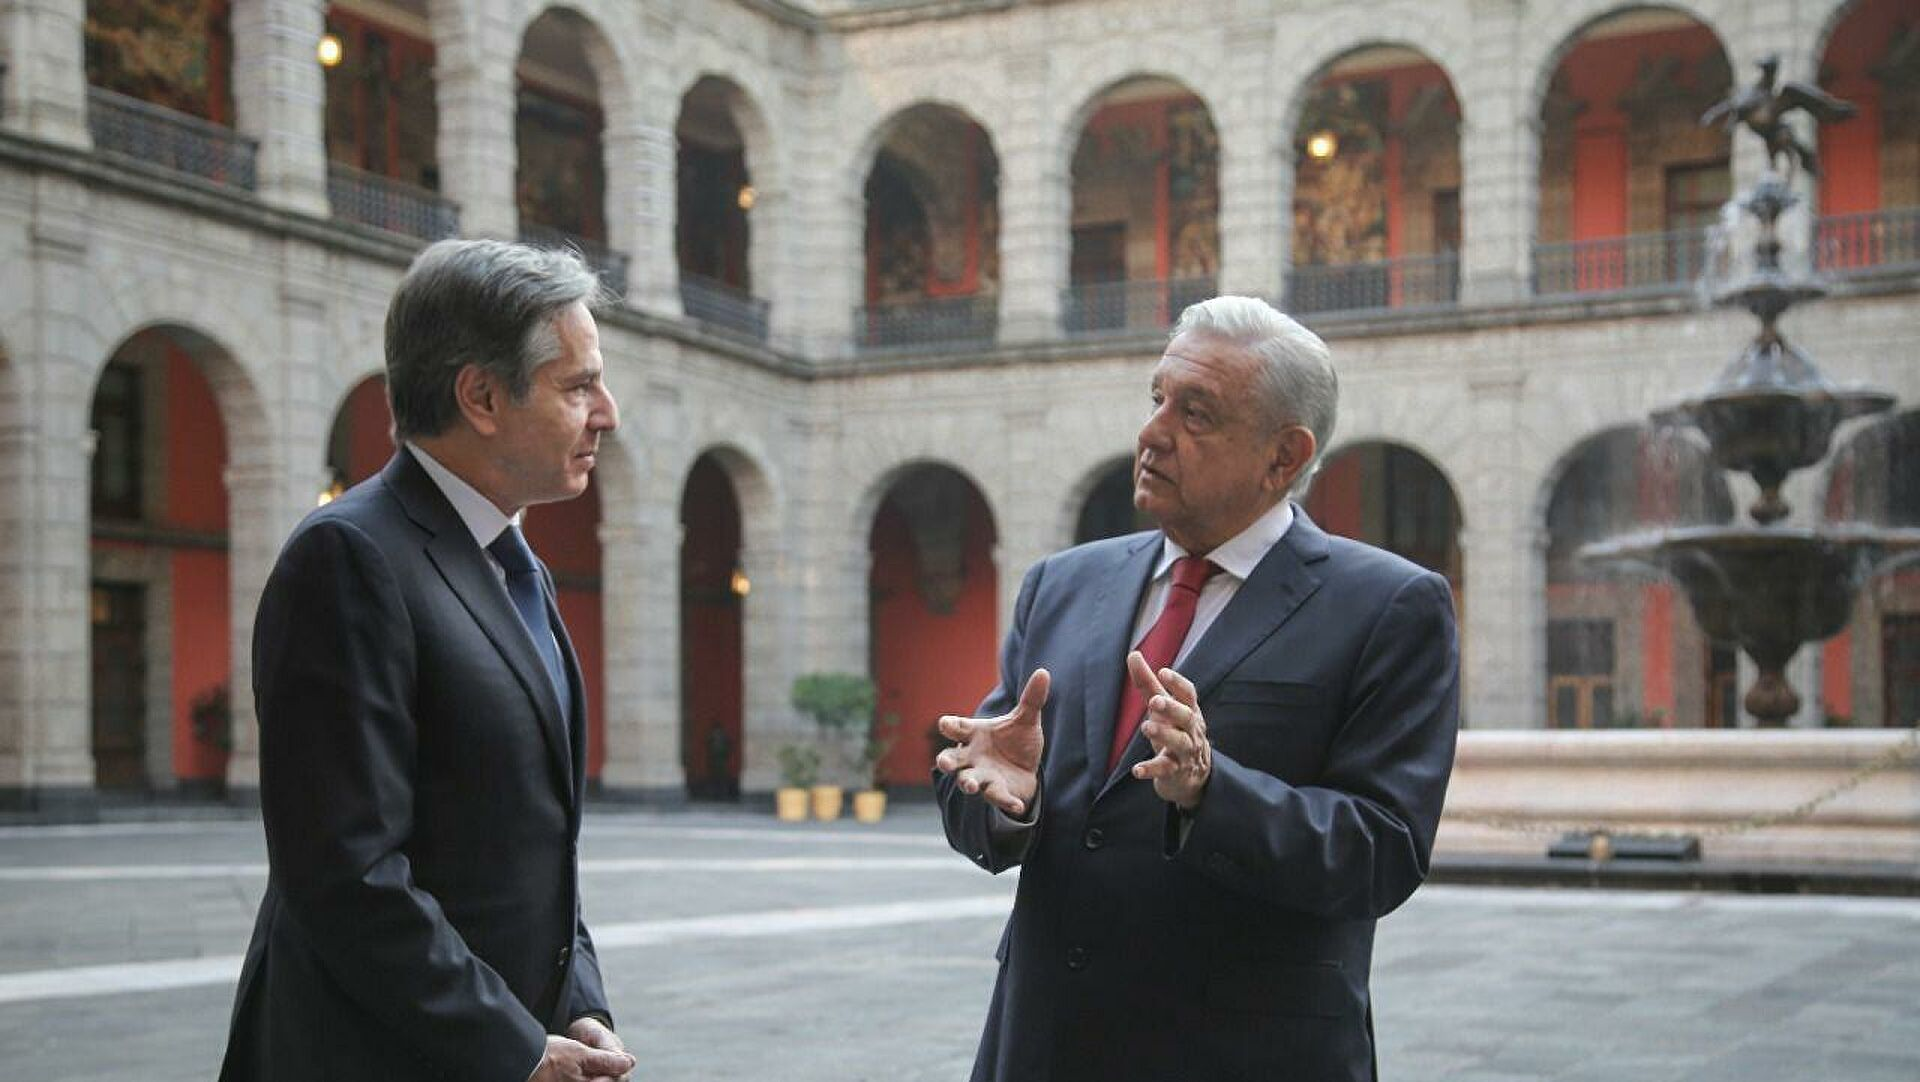 México-EU. Acero bajo la seda / Héctor Aguilar Camín